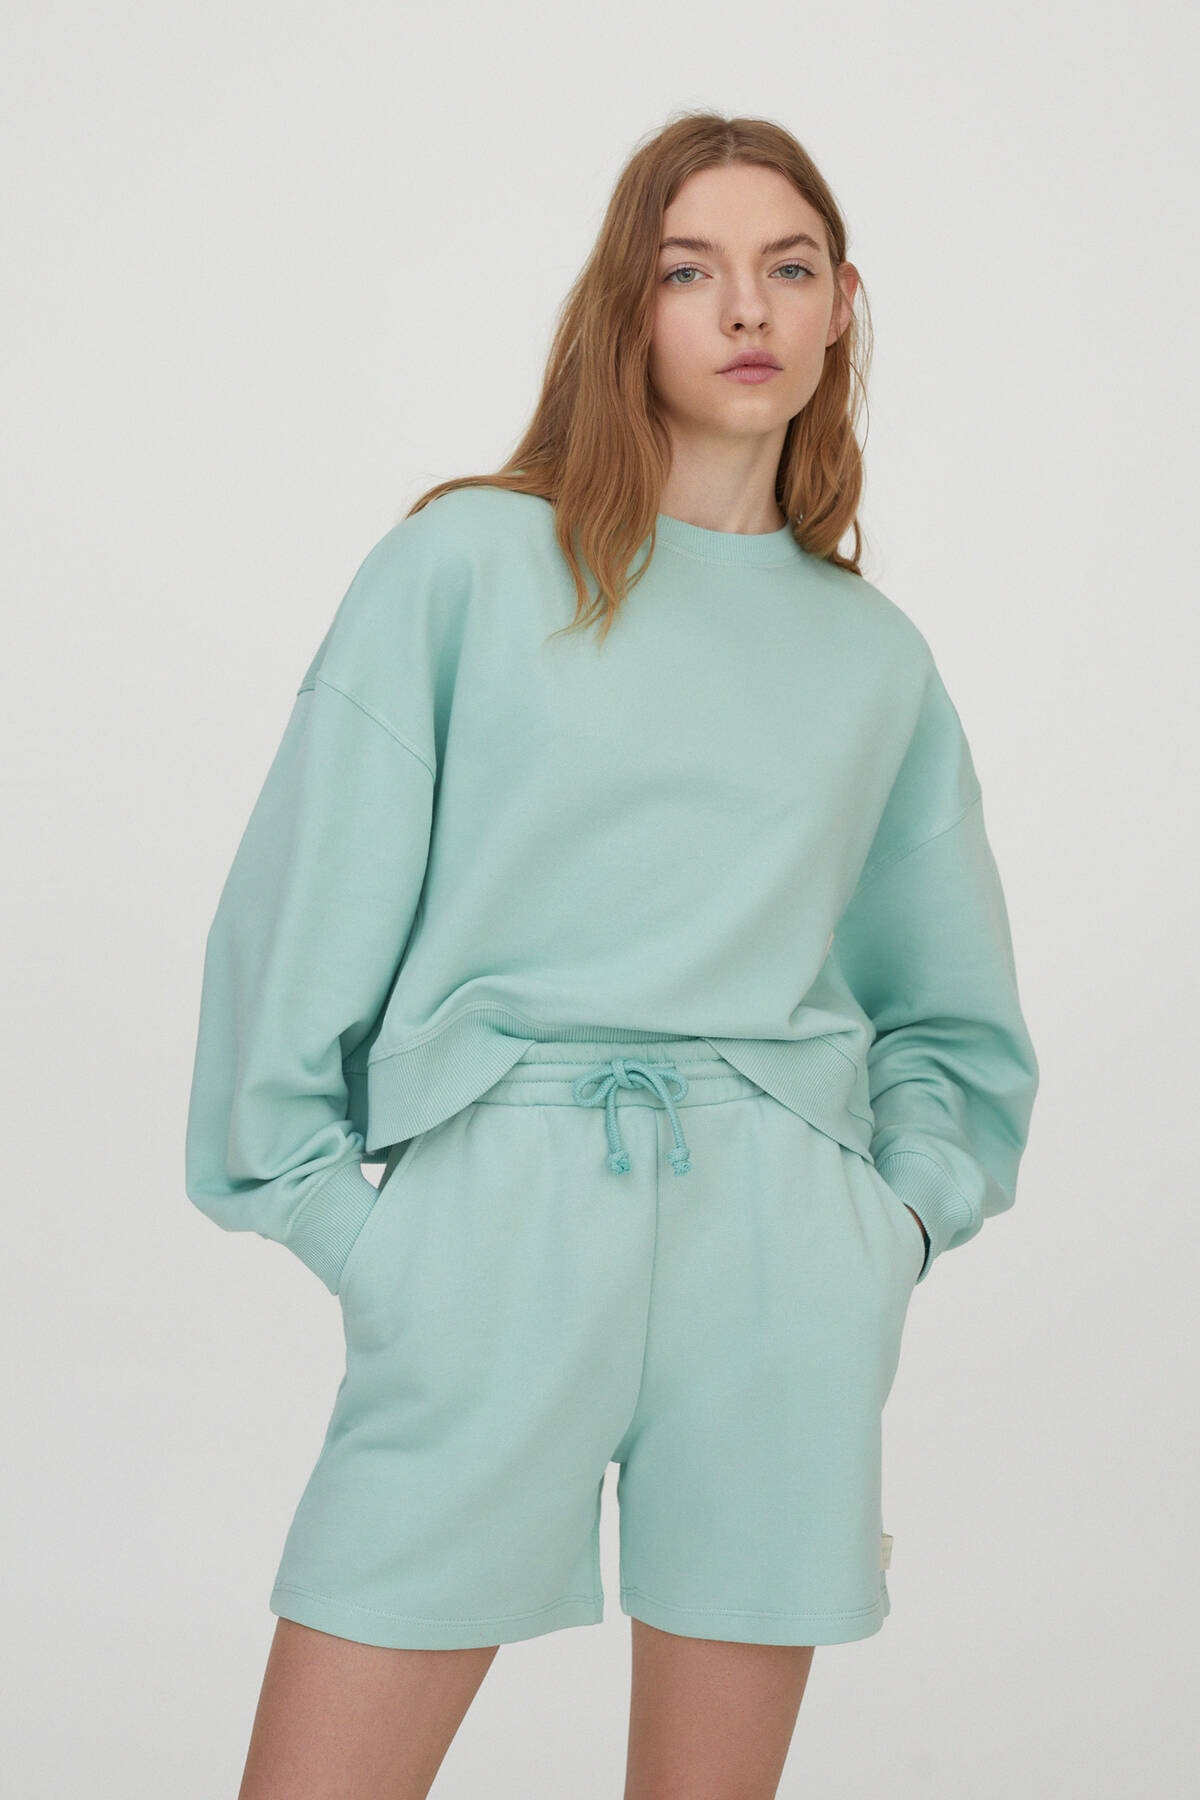 Pull & Bear Kadın Yeşil Bisiklet Yaka Pastel Renkli Sweatshirt 04591376